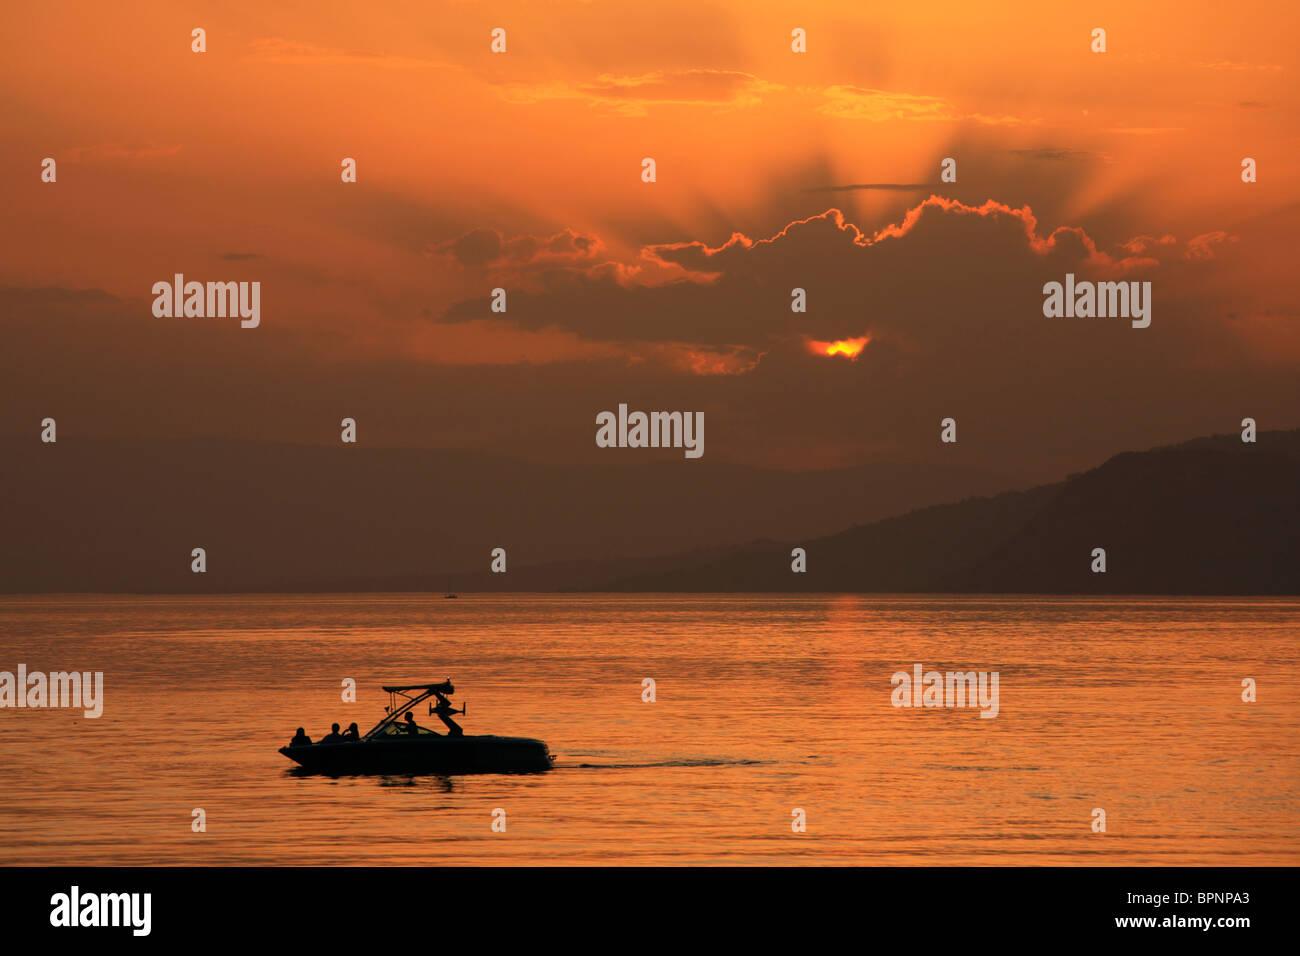 Crepuscular rays make for a dramatic sunset over Lake Geneva in Switzerland - Stock Image